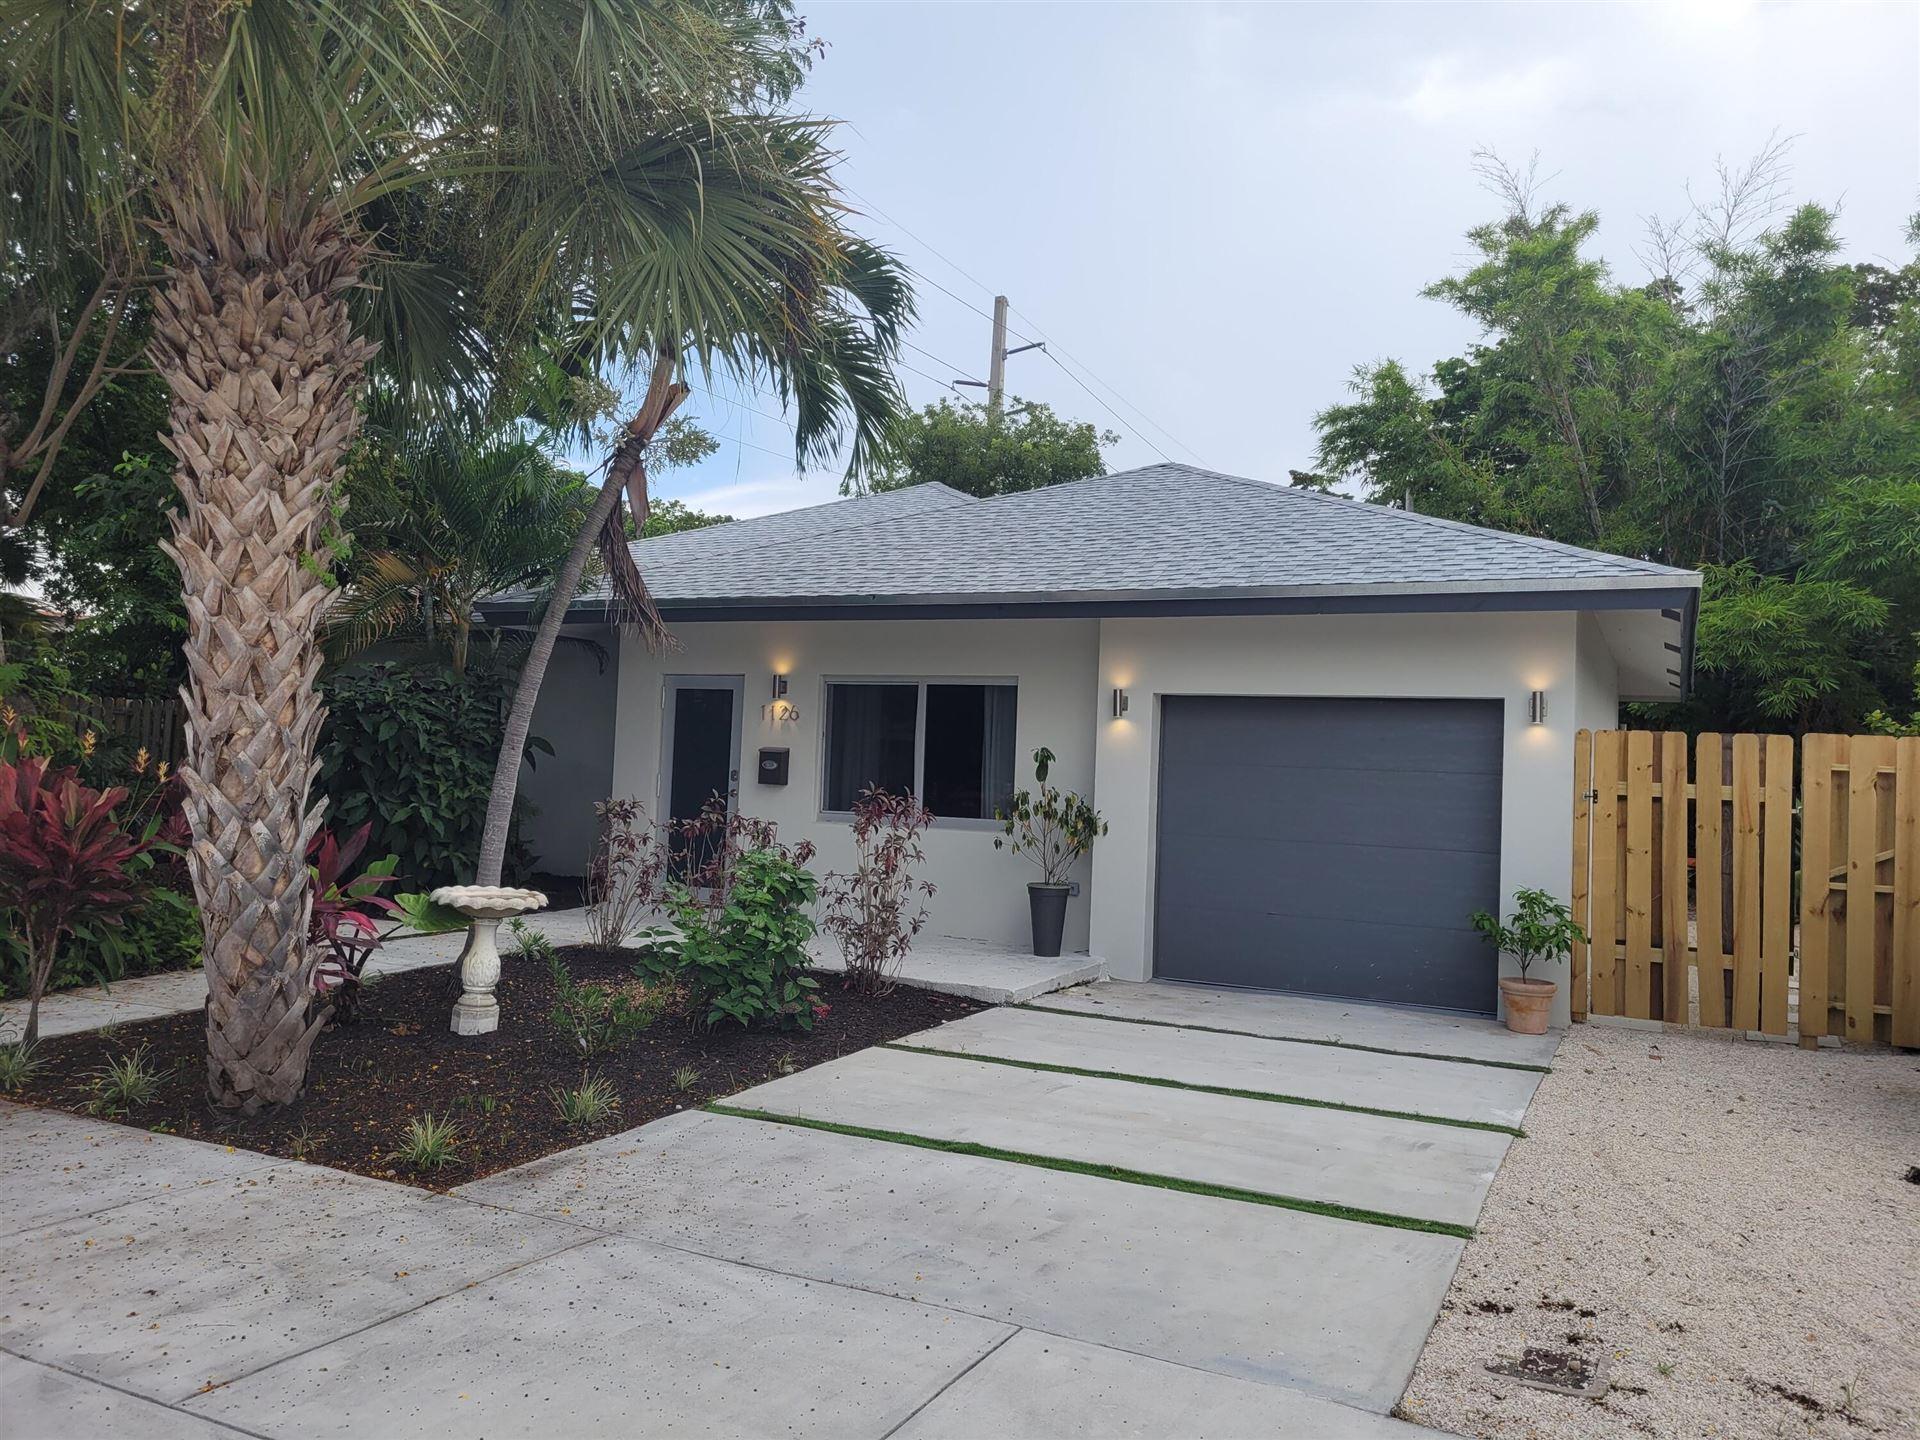 1126 NE 16th Court, Fort Lauderdale, FL 33305 - MLS#: RX-10742674